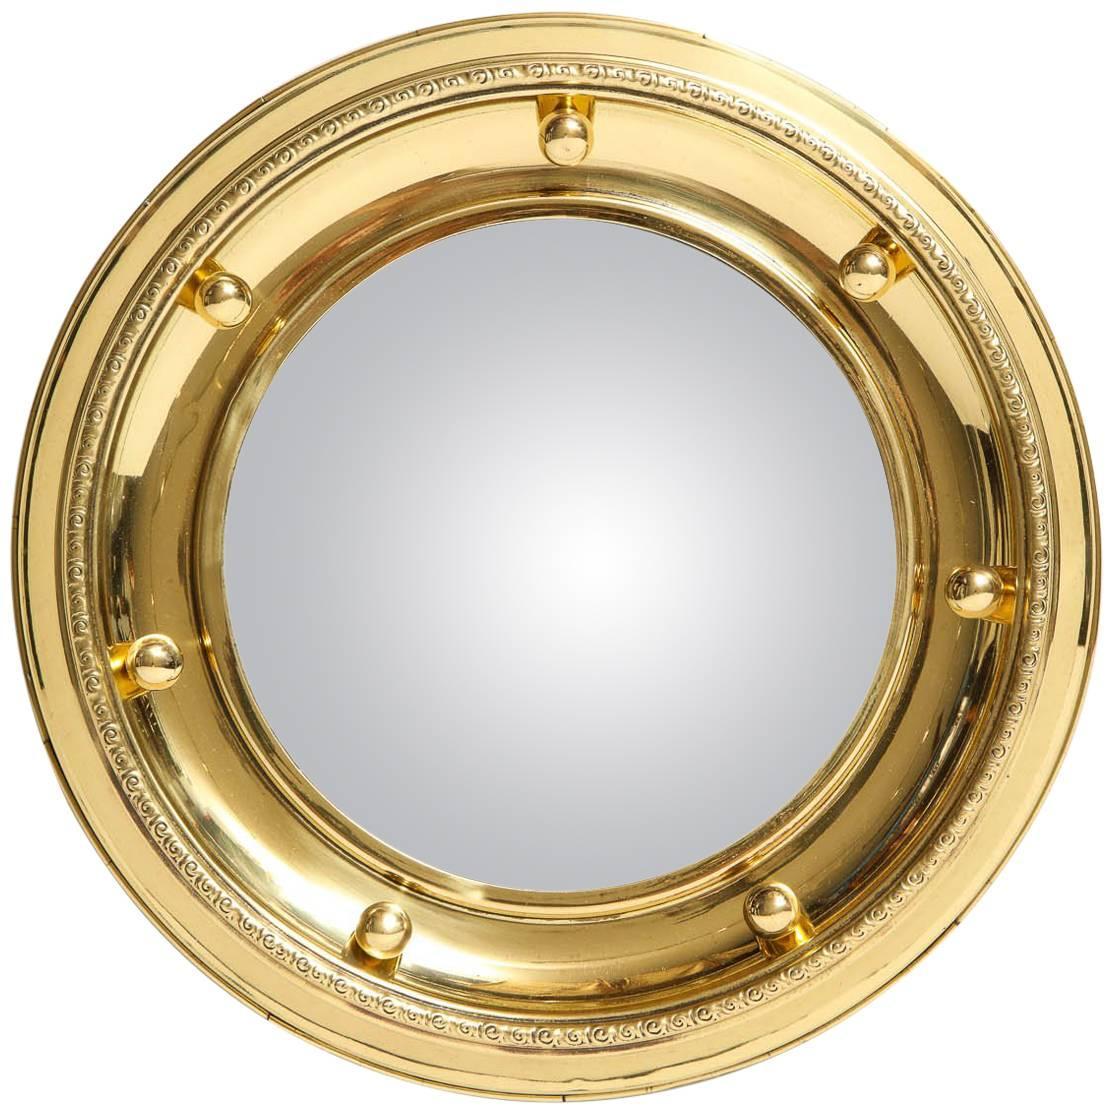 1930s English Brass Port Hole Mirror